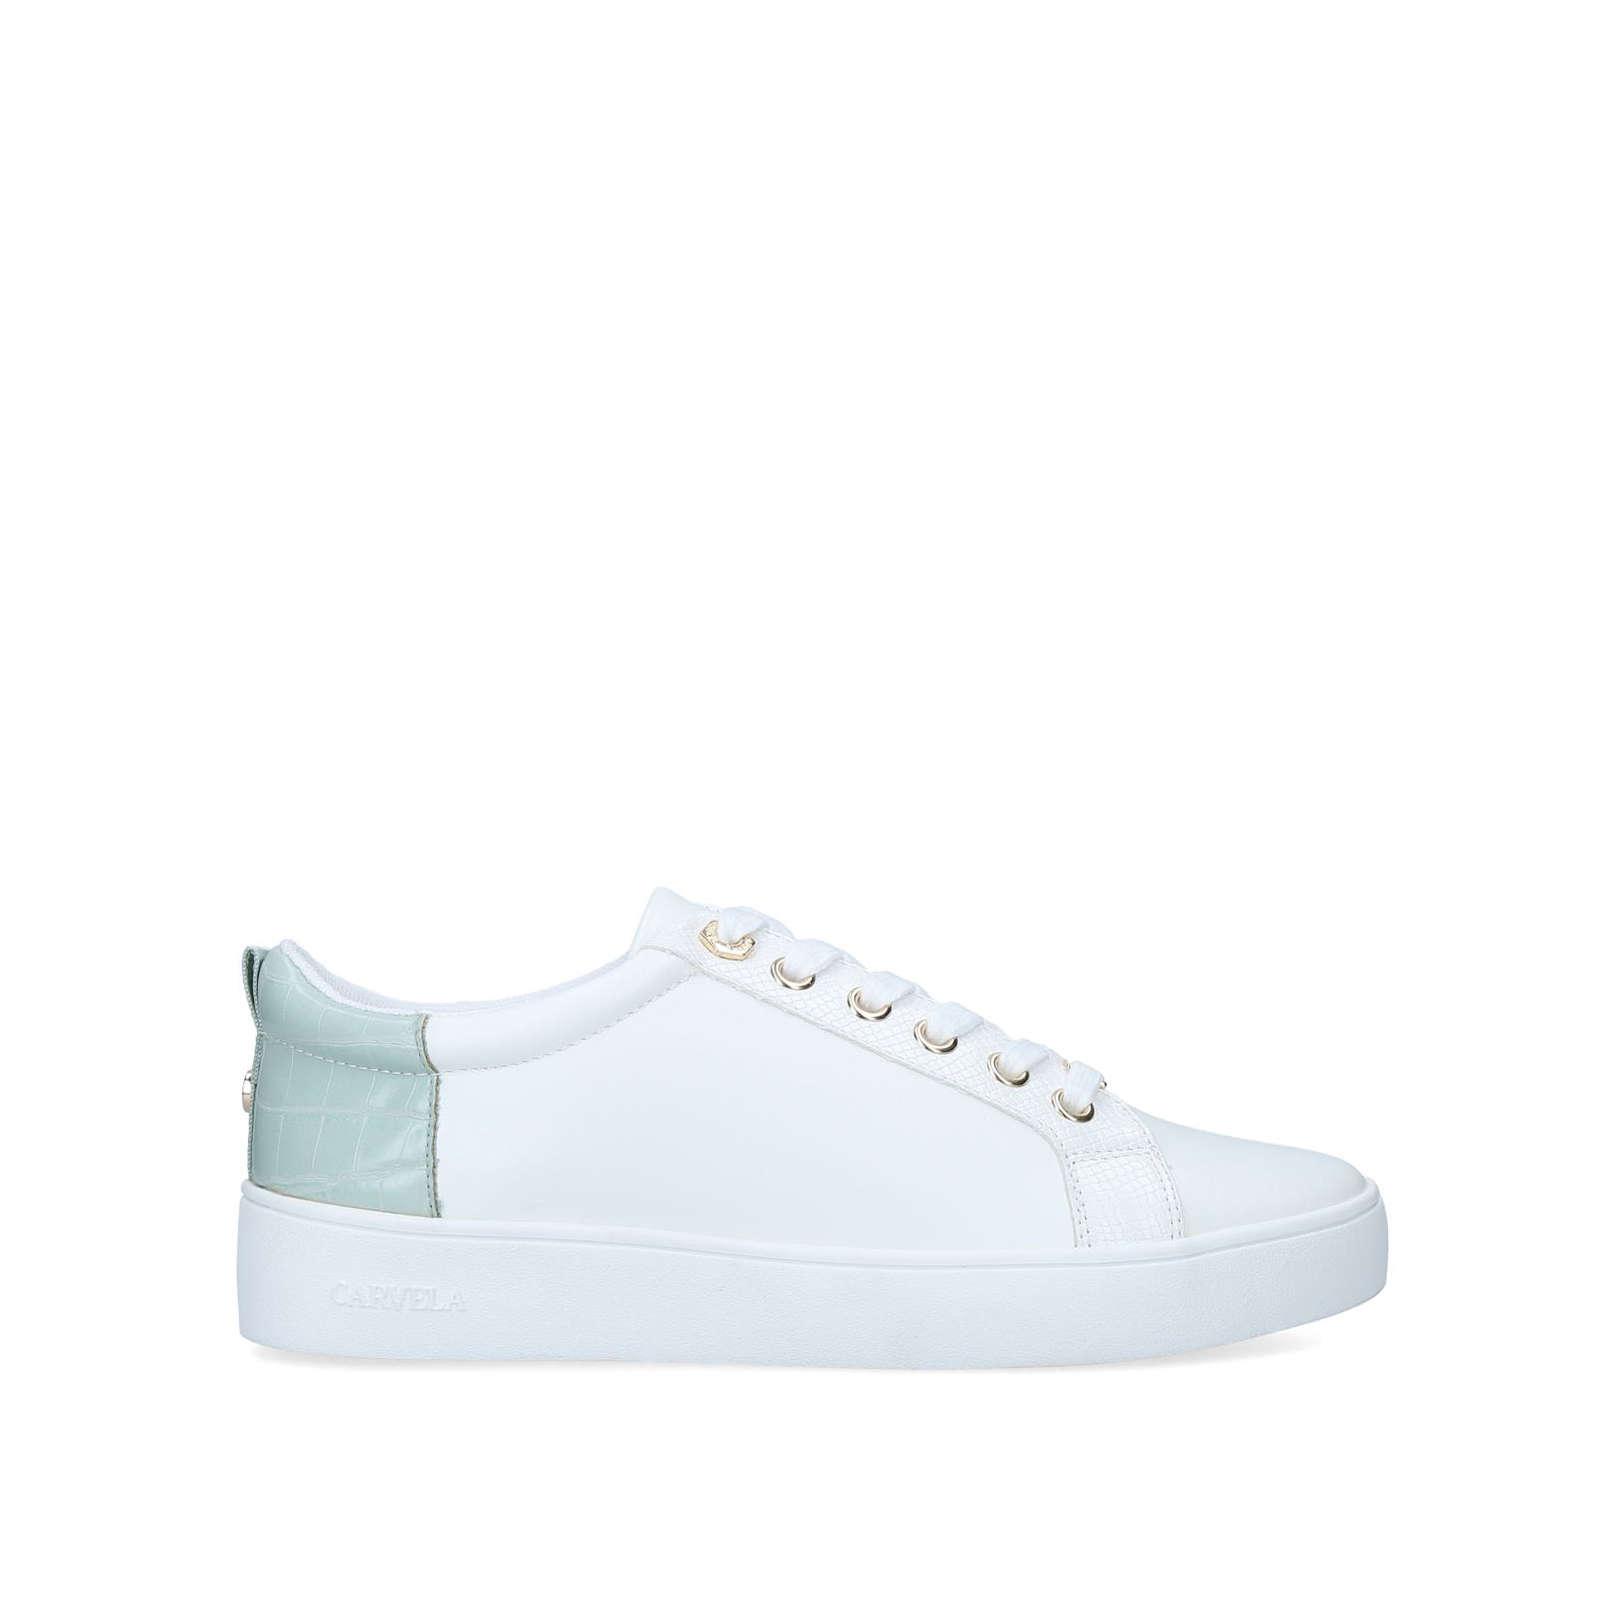 JUPITER - CARVELA Sneakers